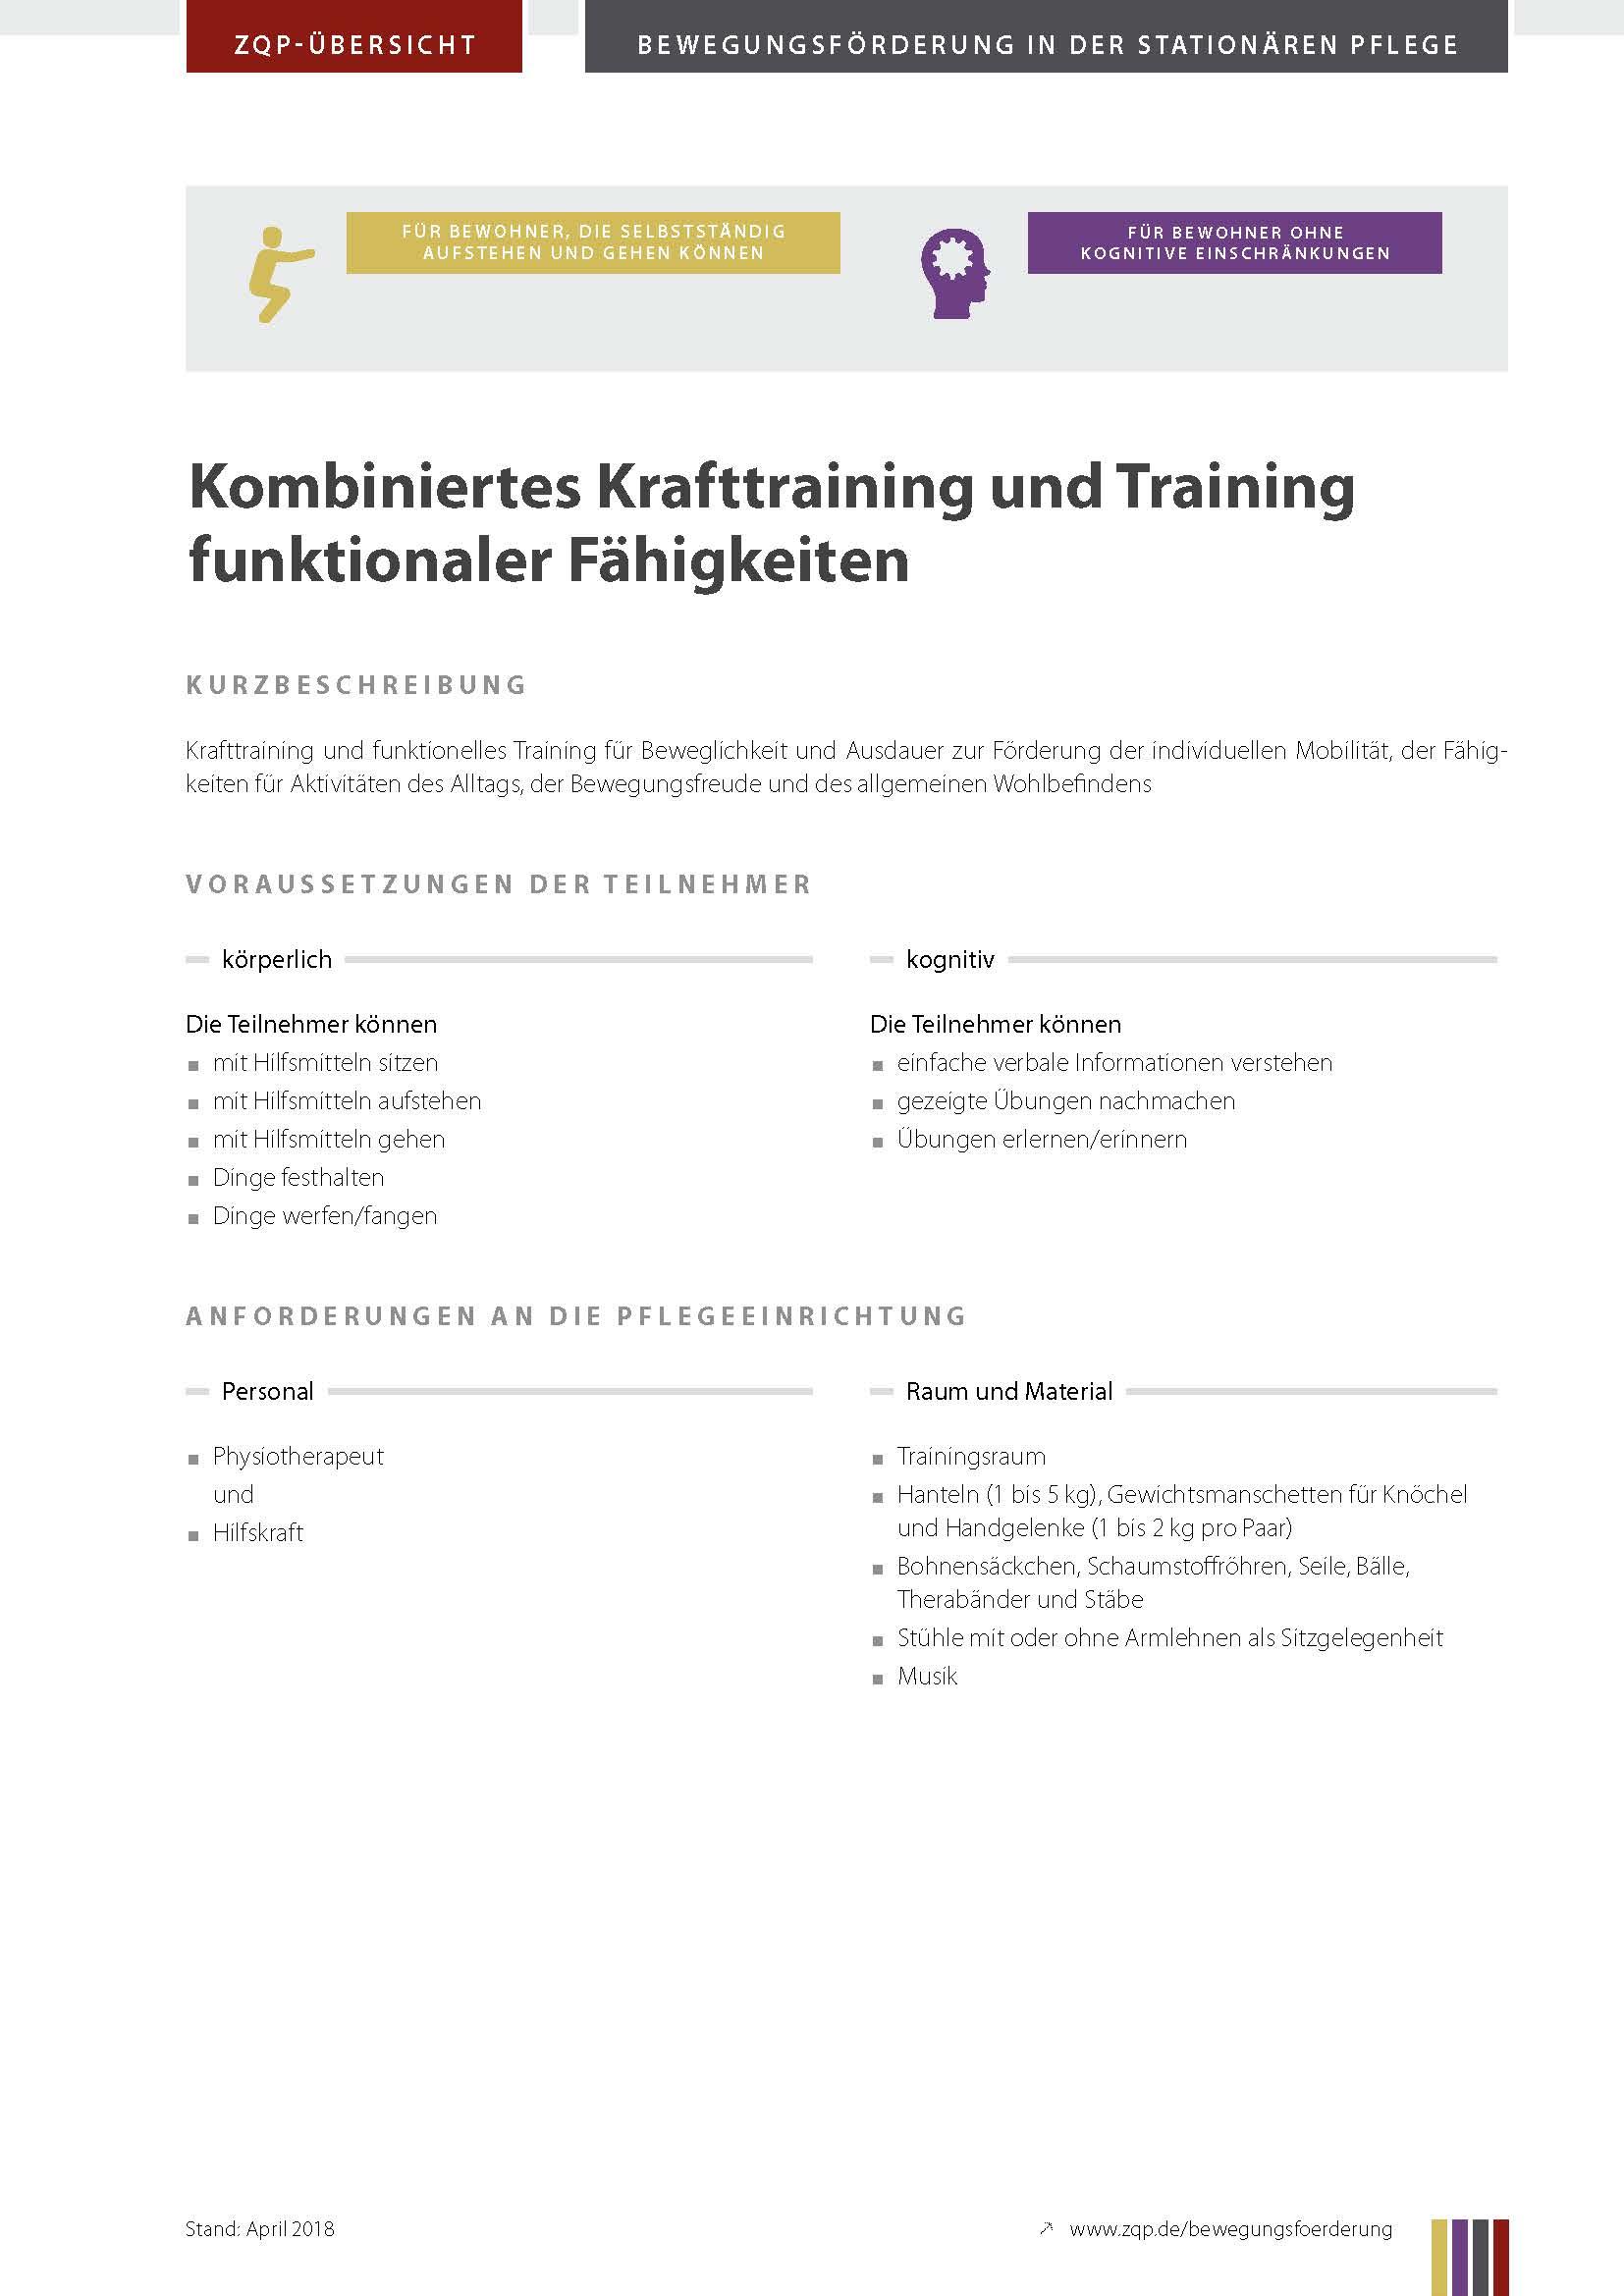 Titelblatt Kombiniertes Krafttraining und Training funktionaler Fähigkeiten